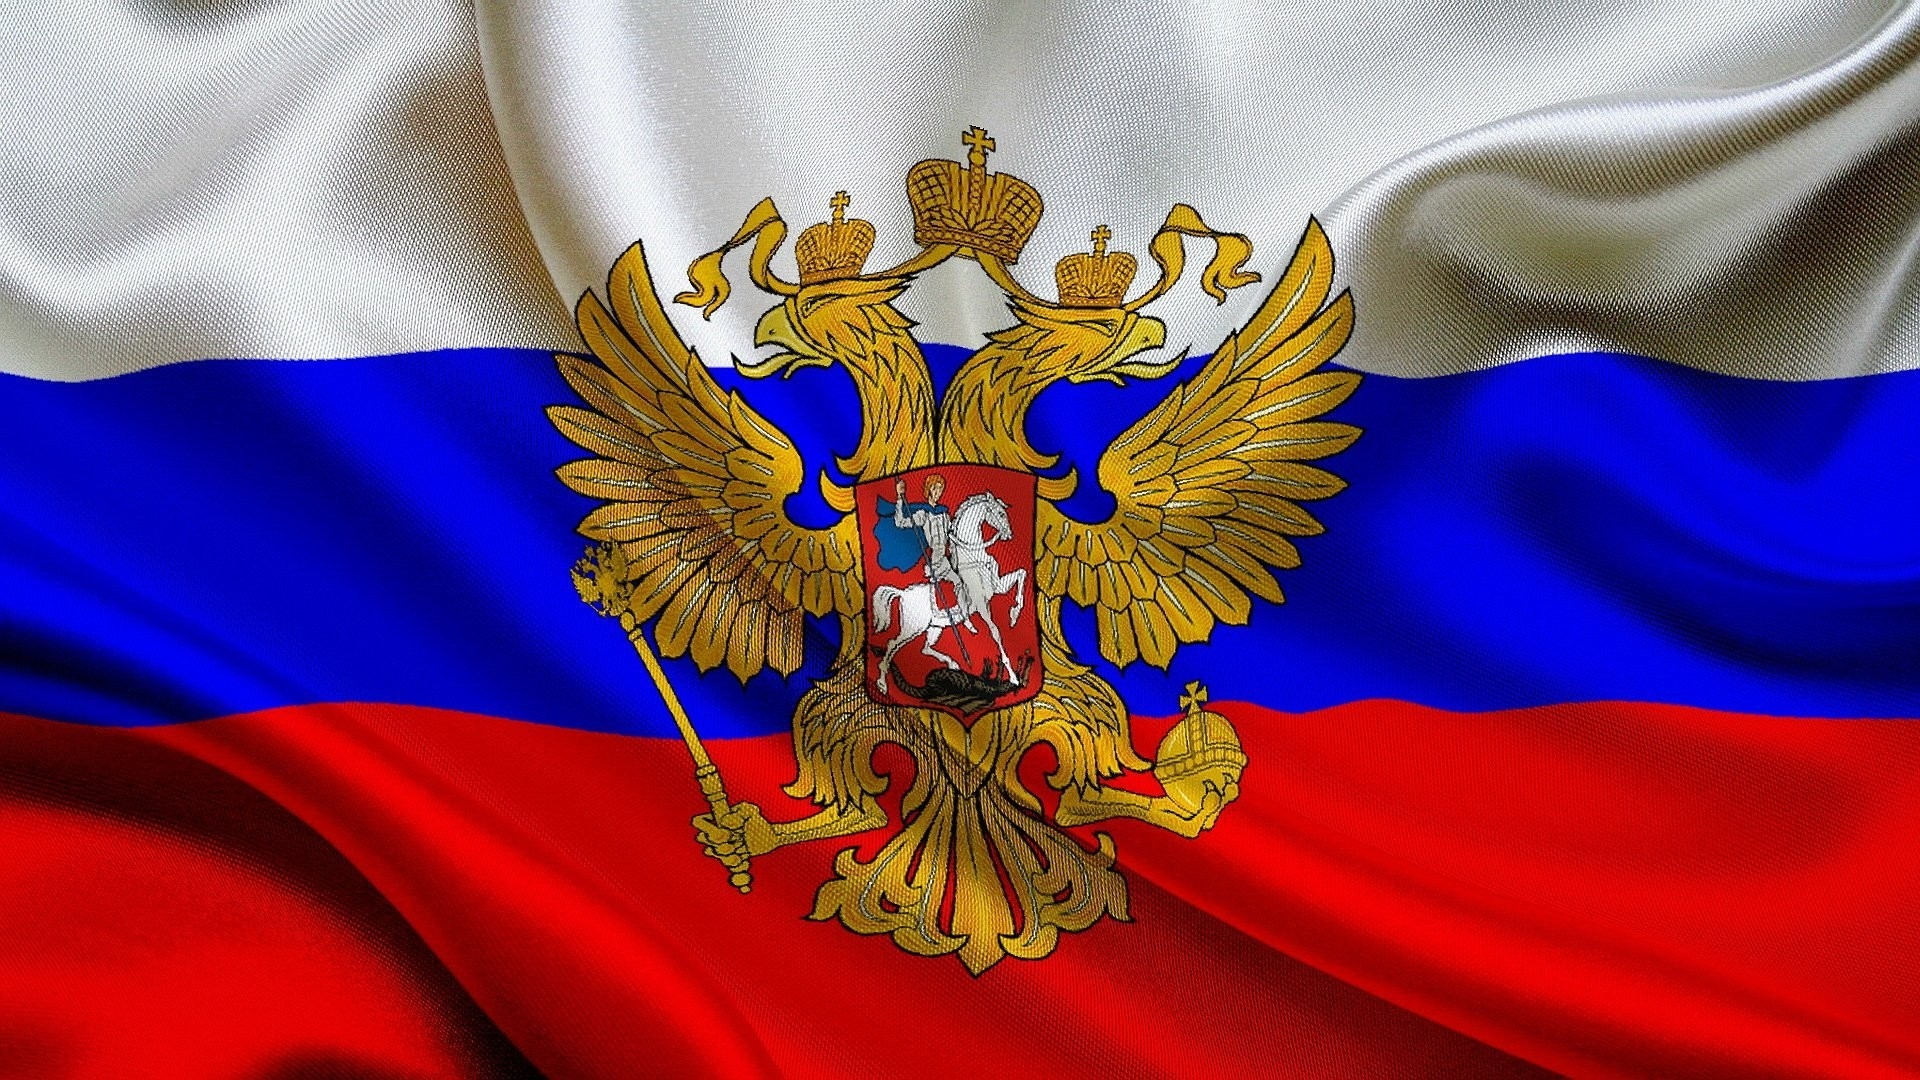 drapeau russe2.jpg